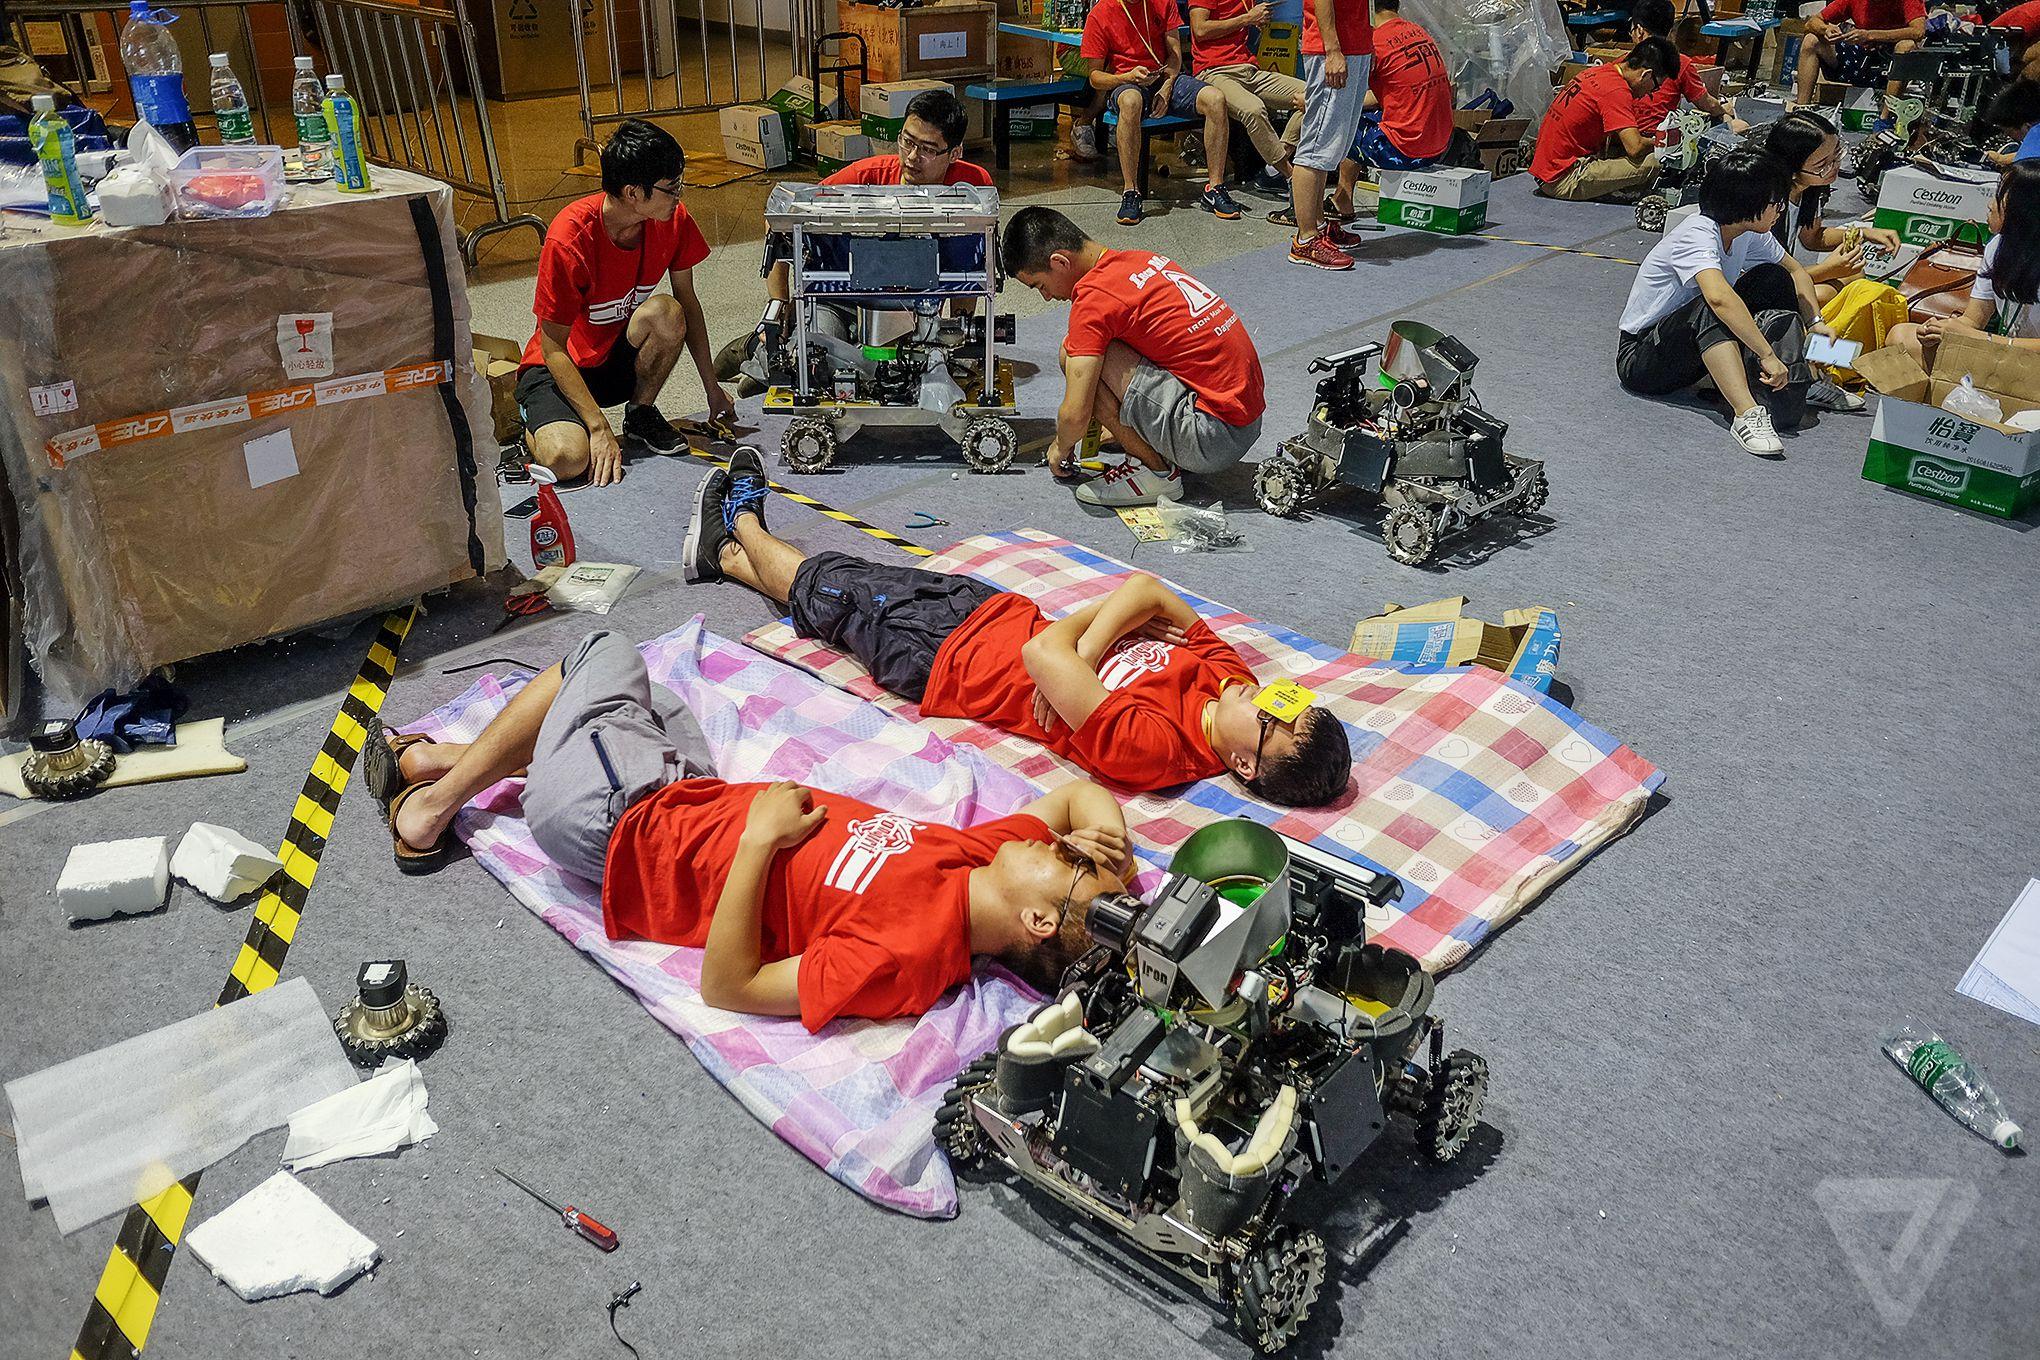 RoboMasters sleeping